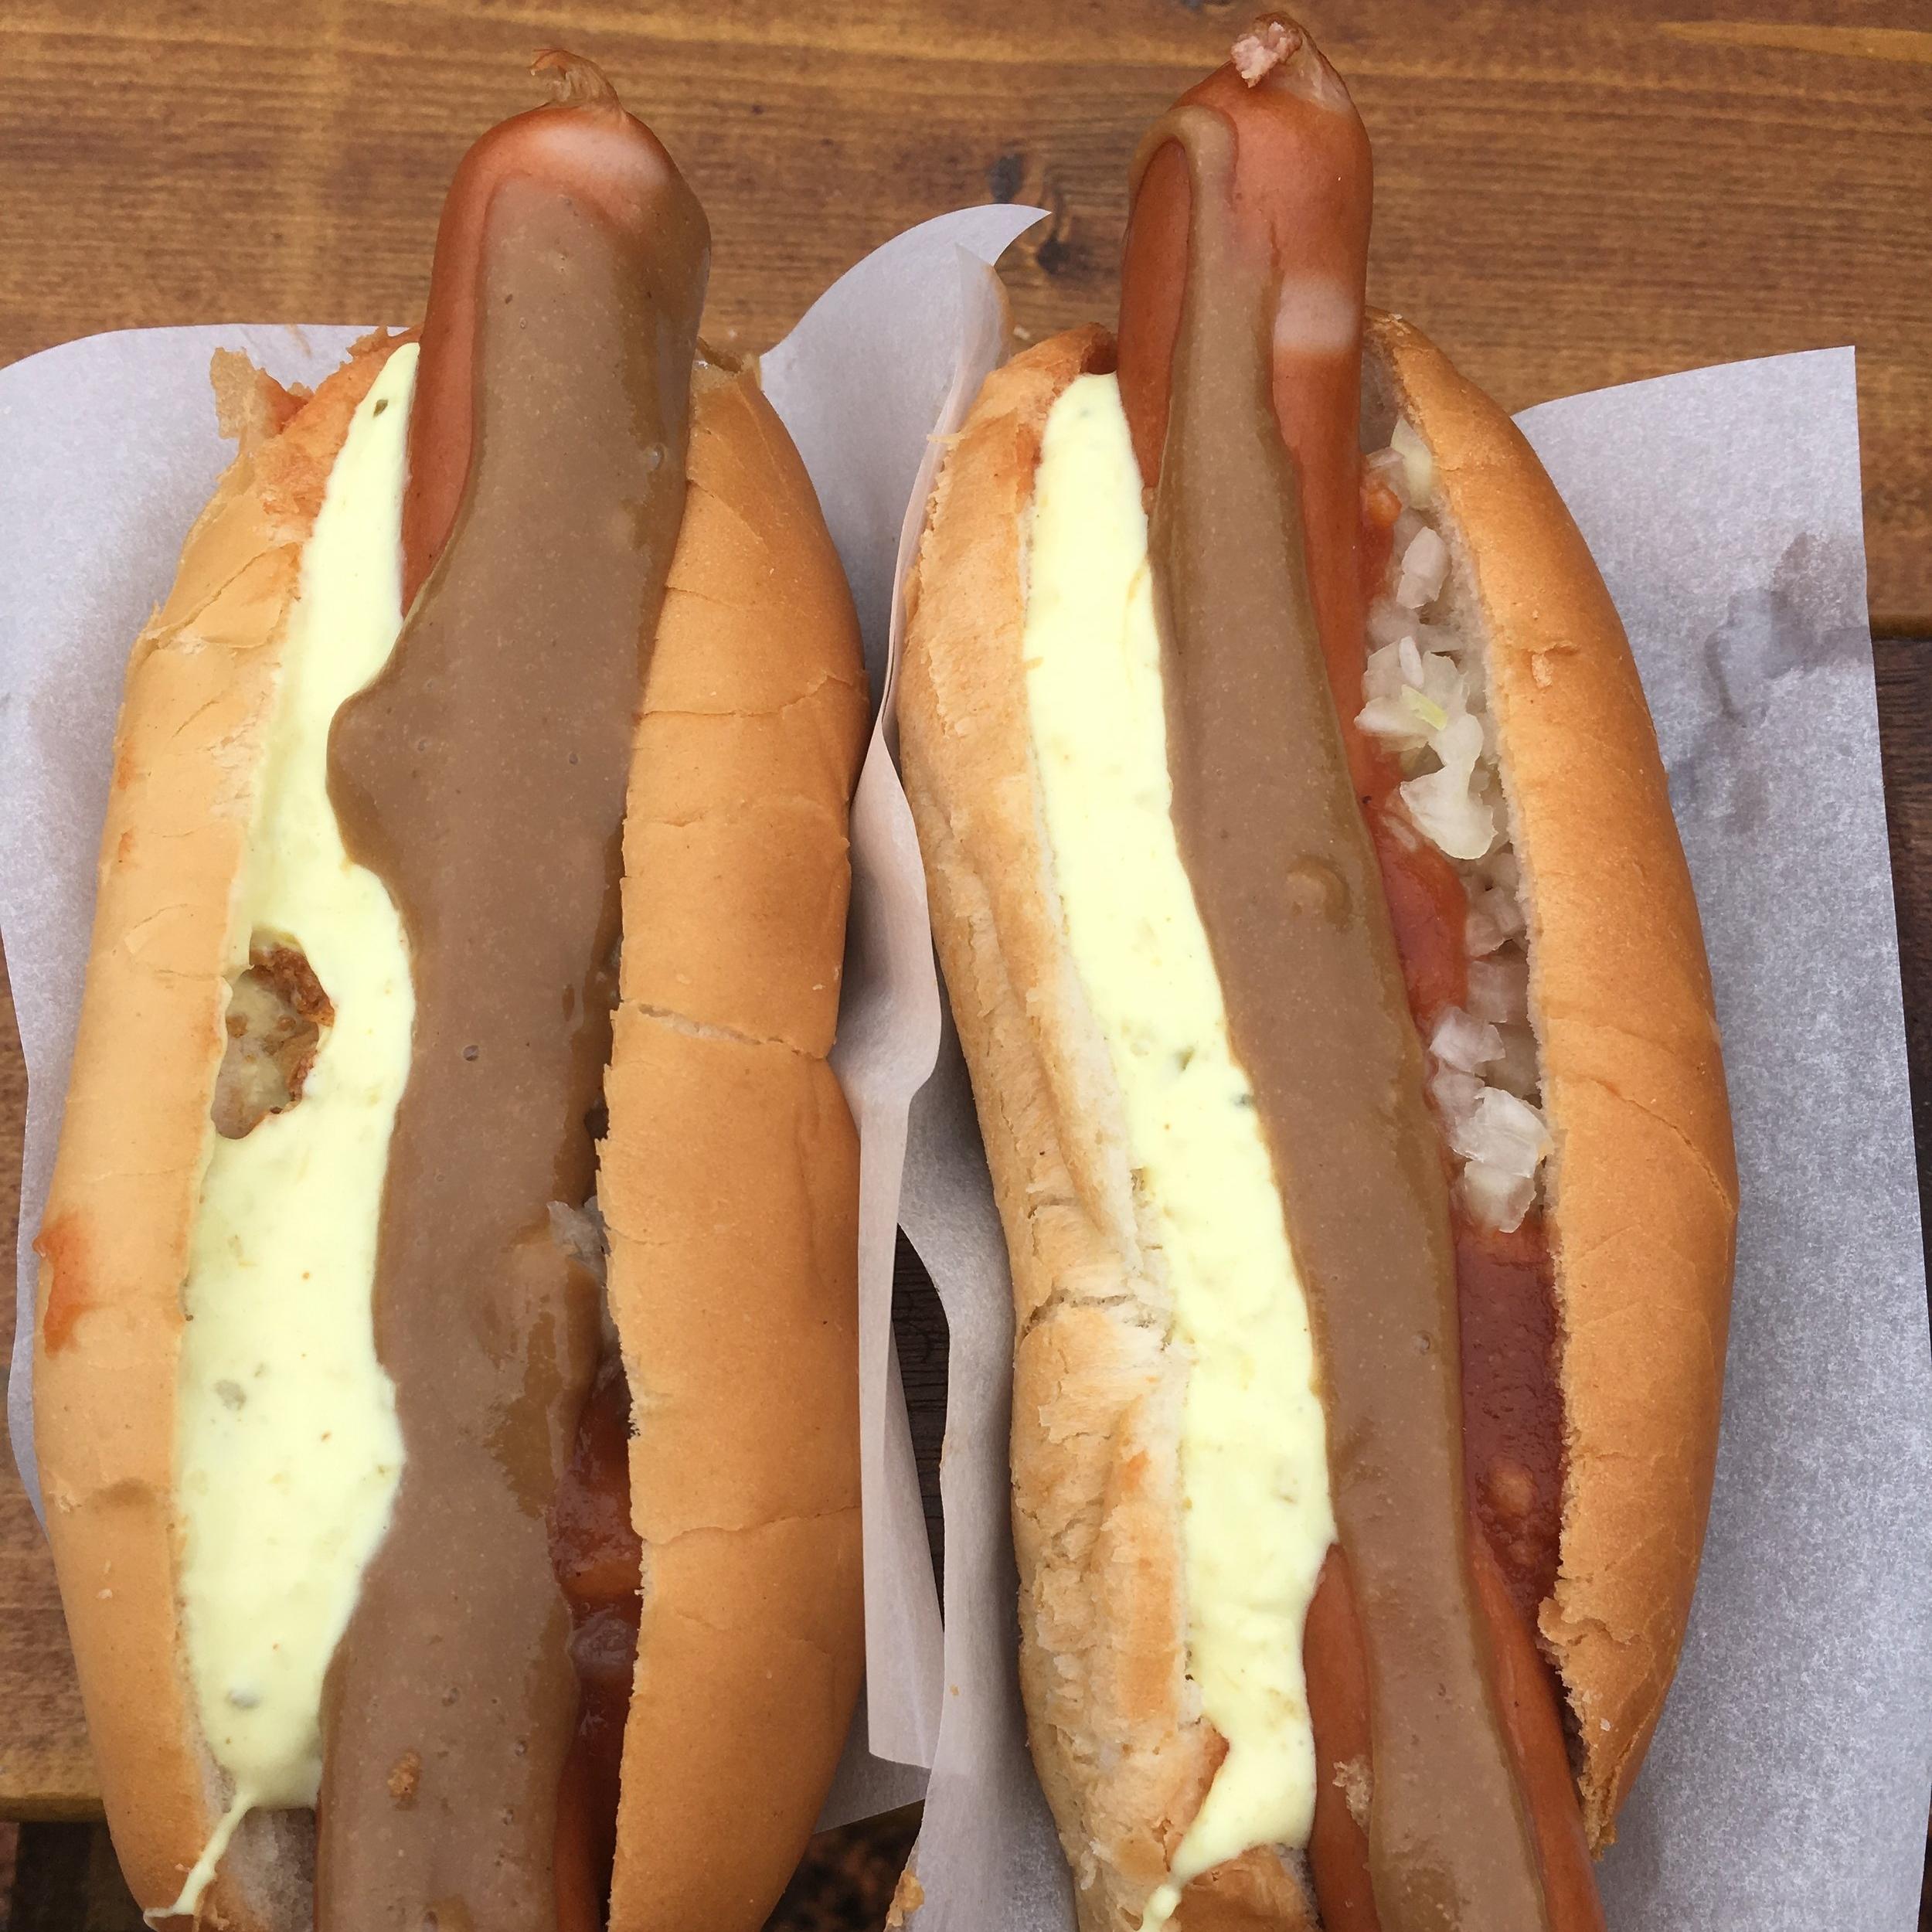 Hot dogs, Reykjavik by The Doubtful Traveller